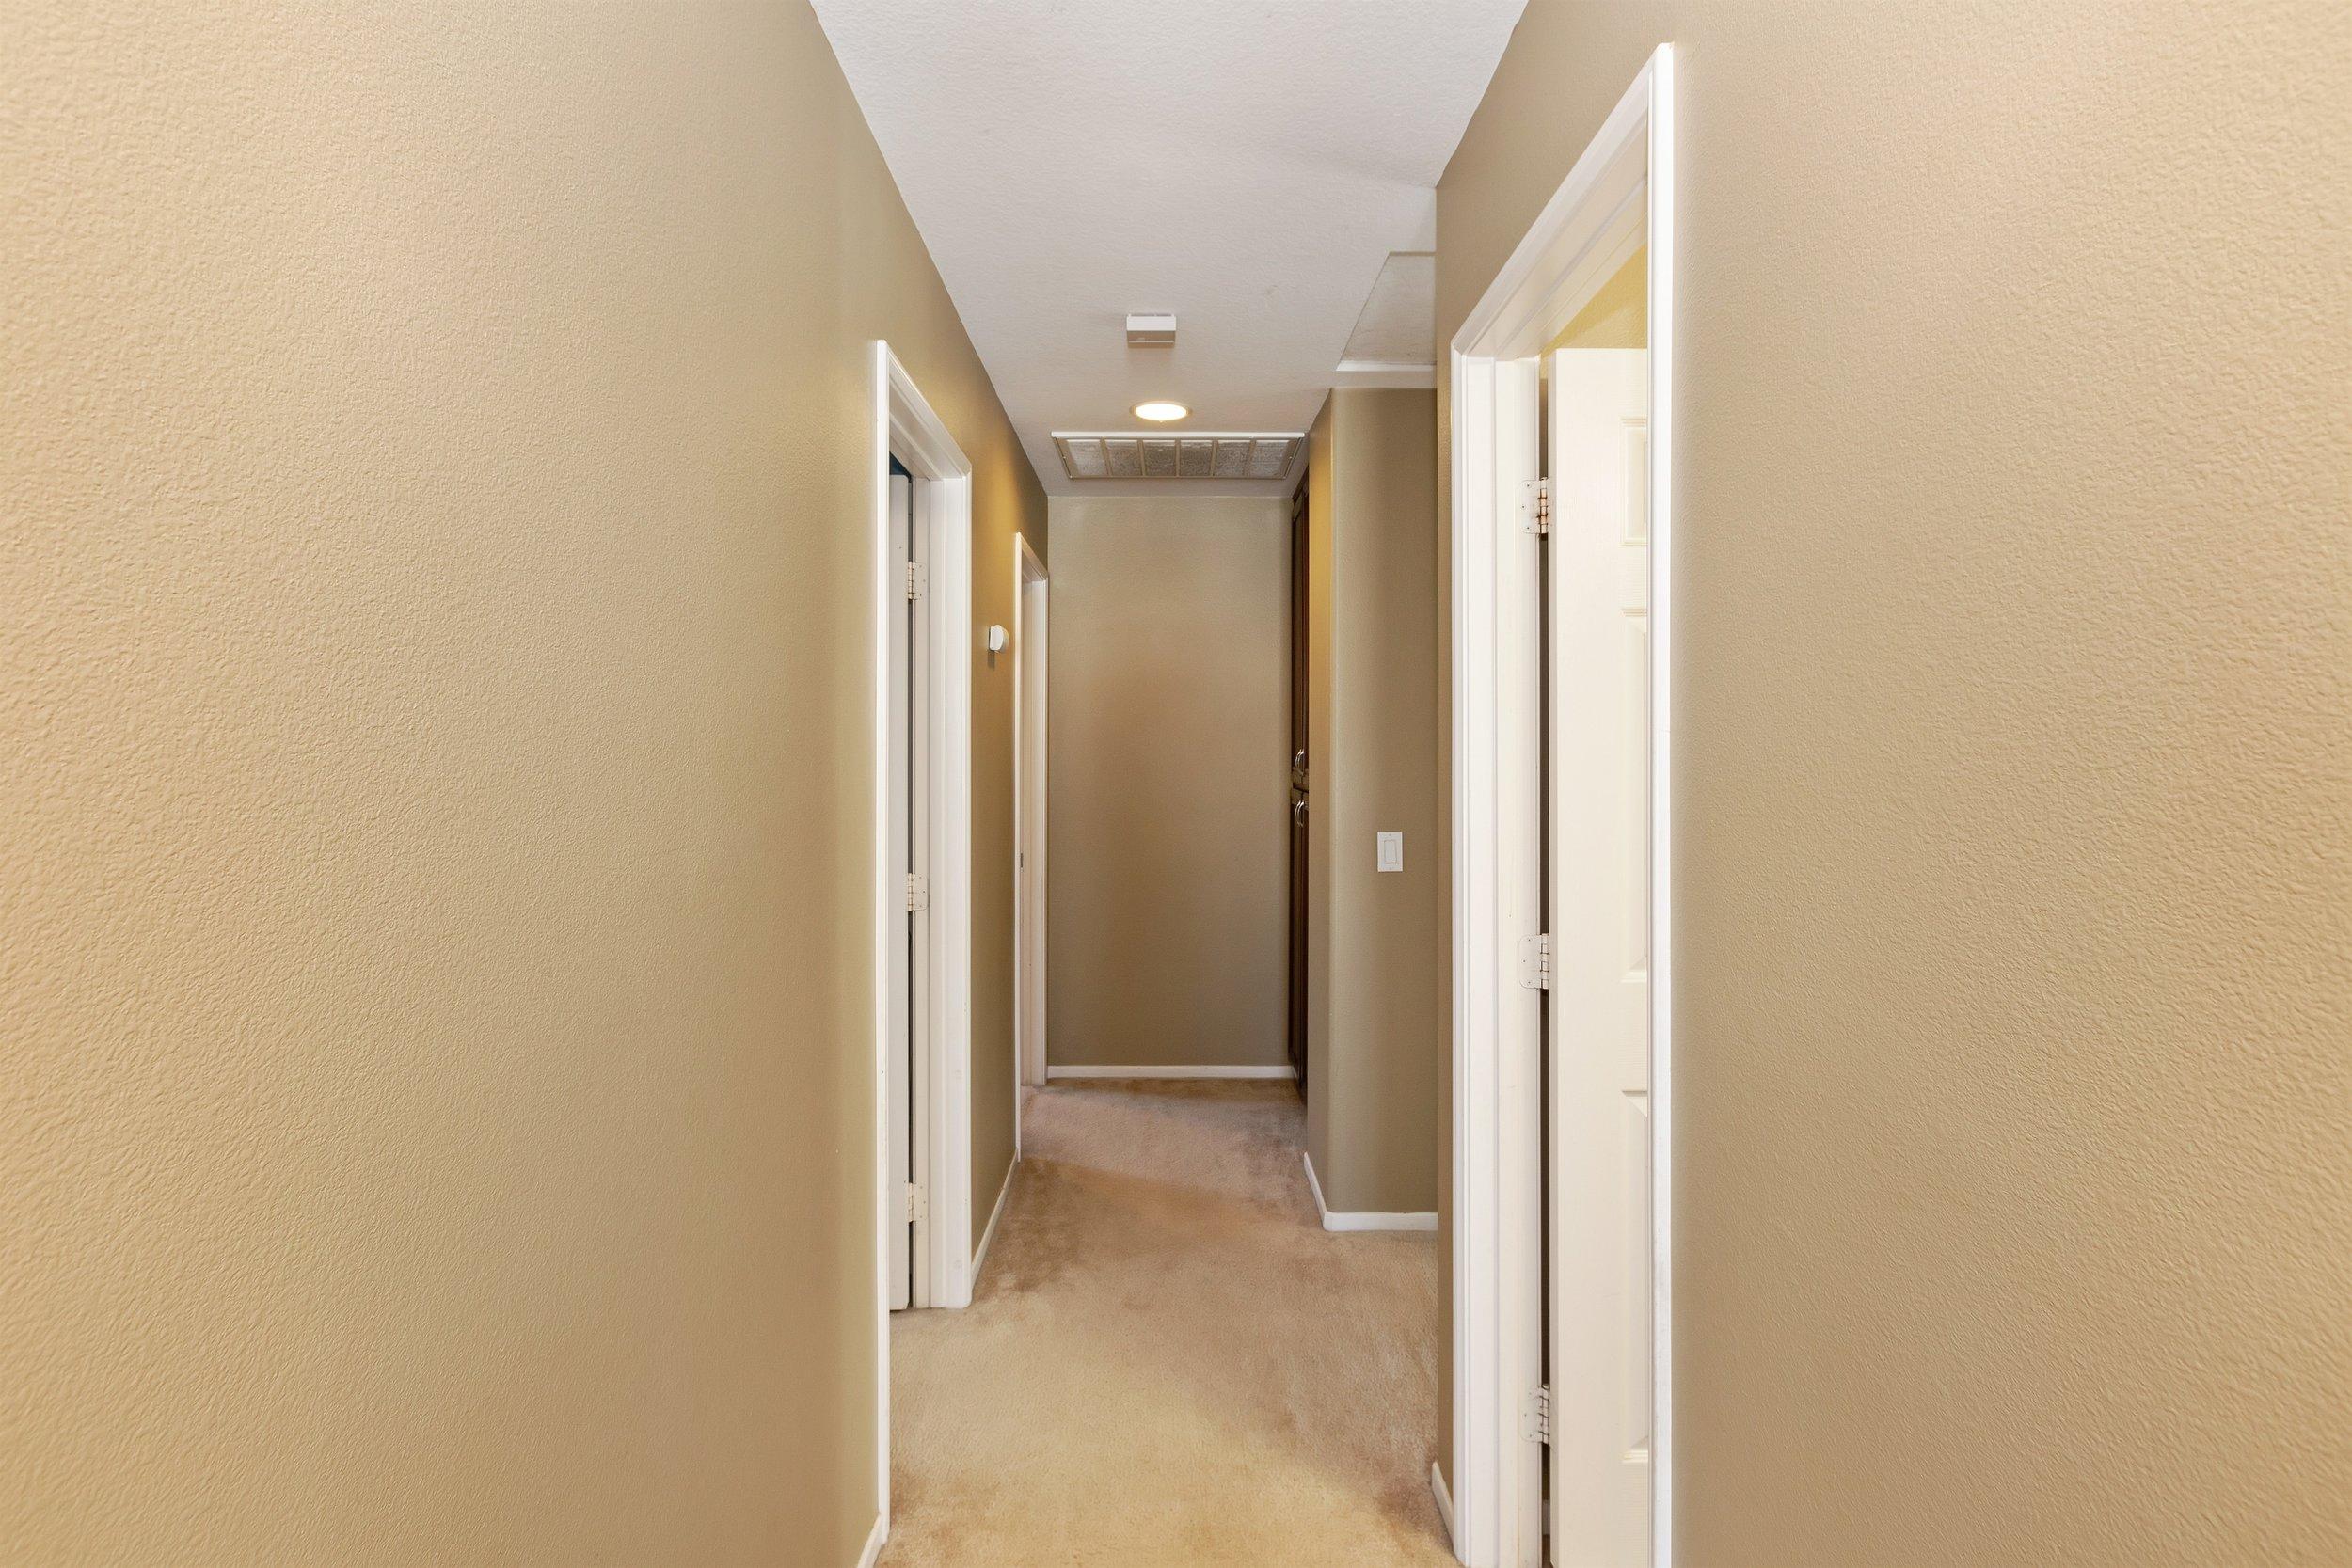 018_Hallway.jpg